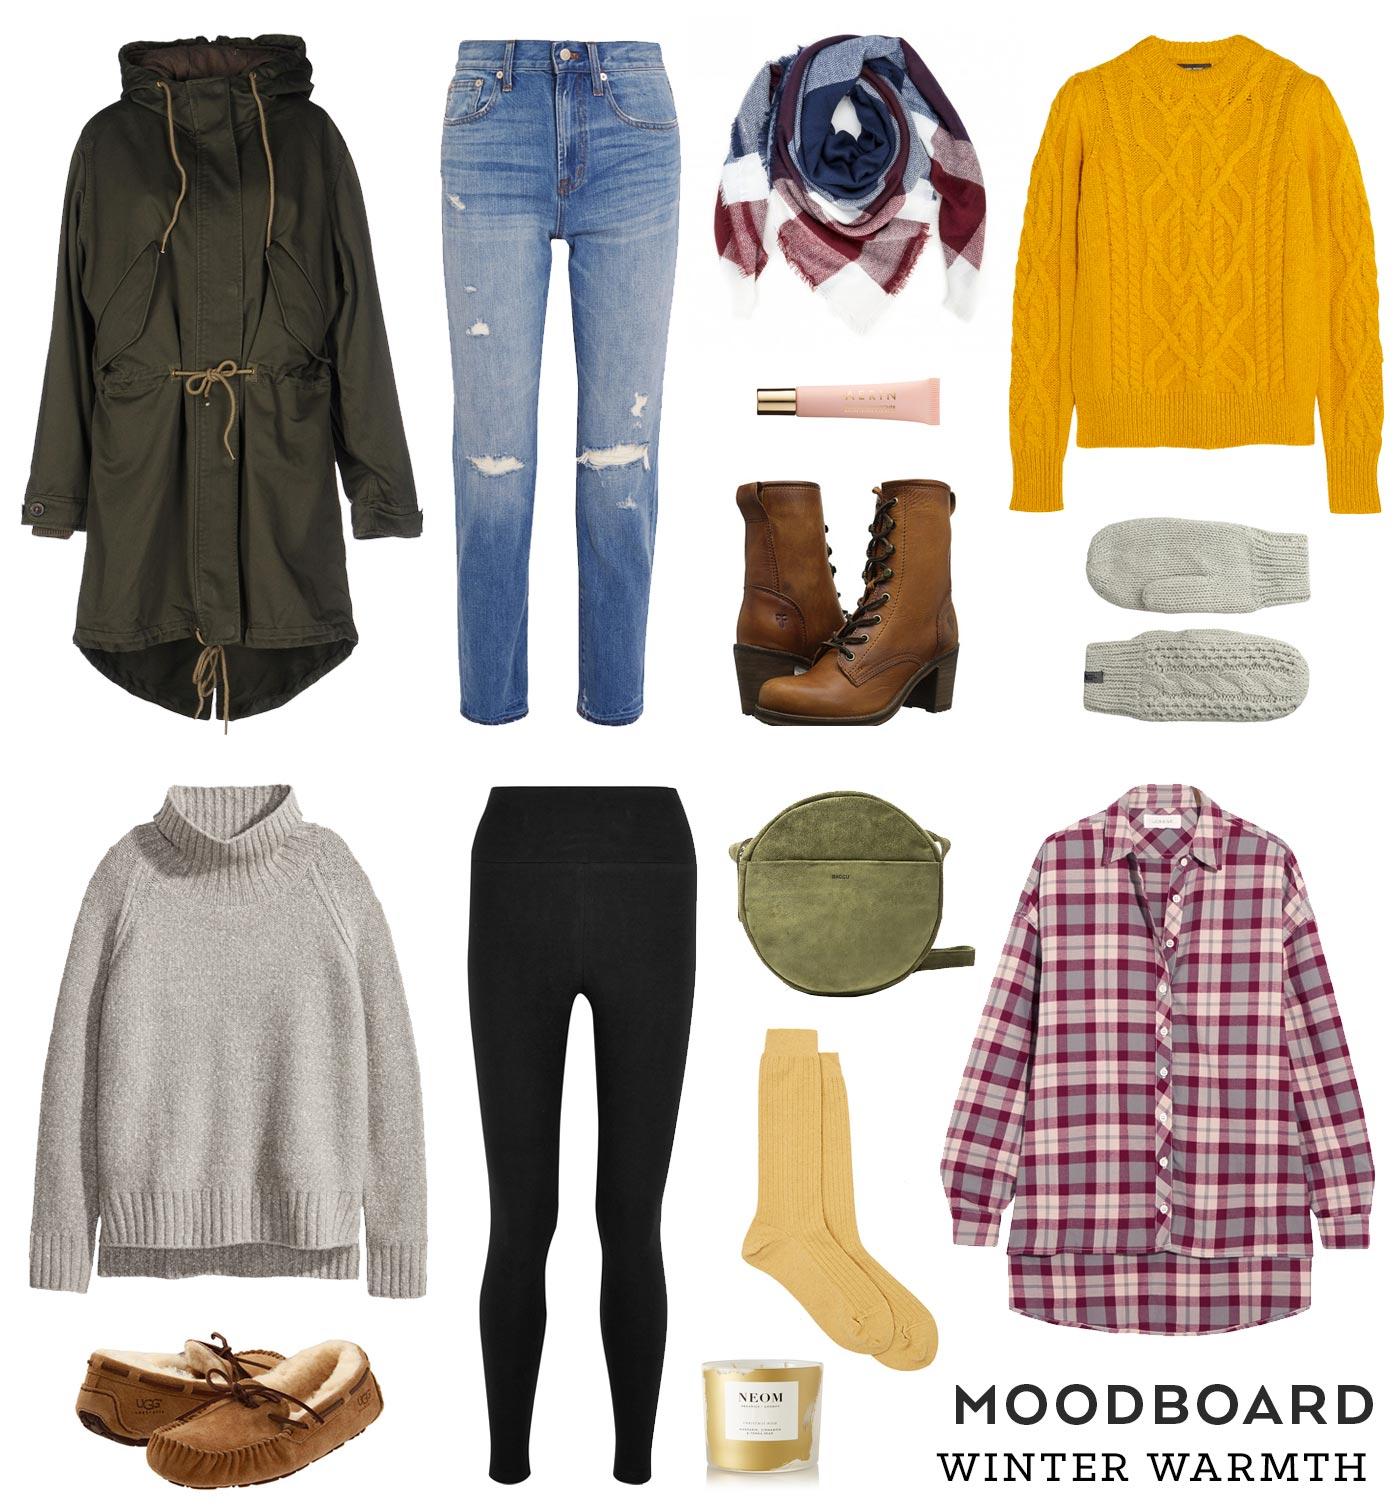 Moodboard –Winter Warmth | Sew DIY